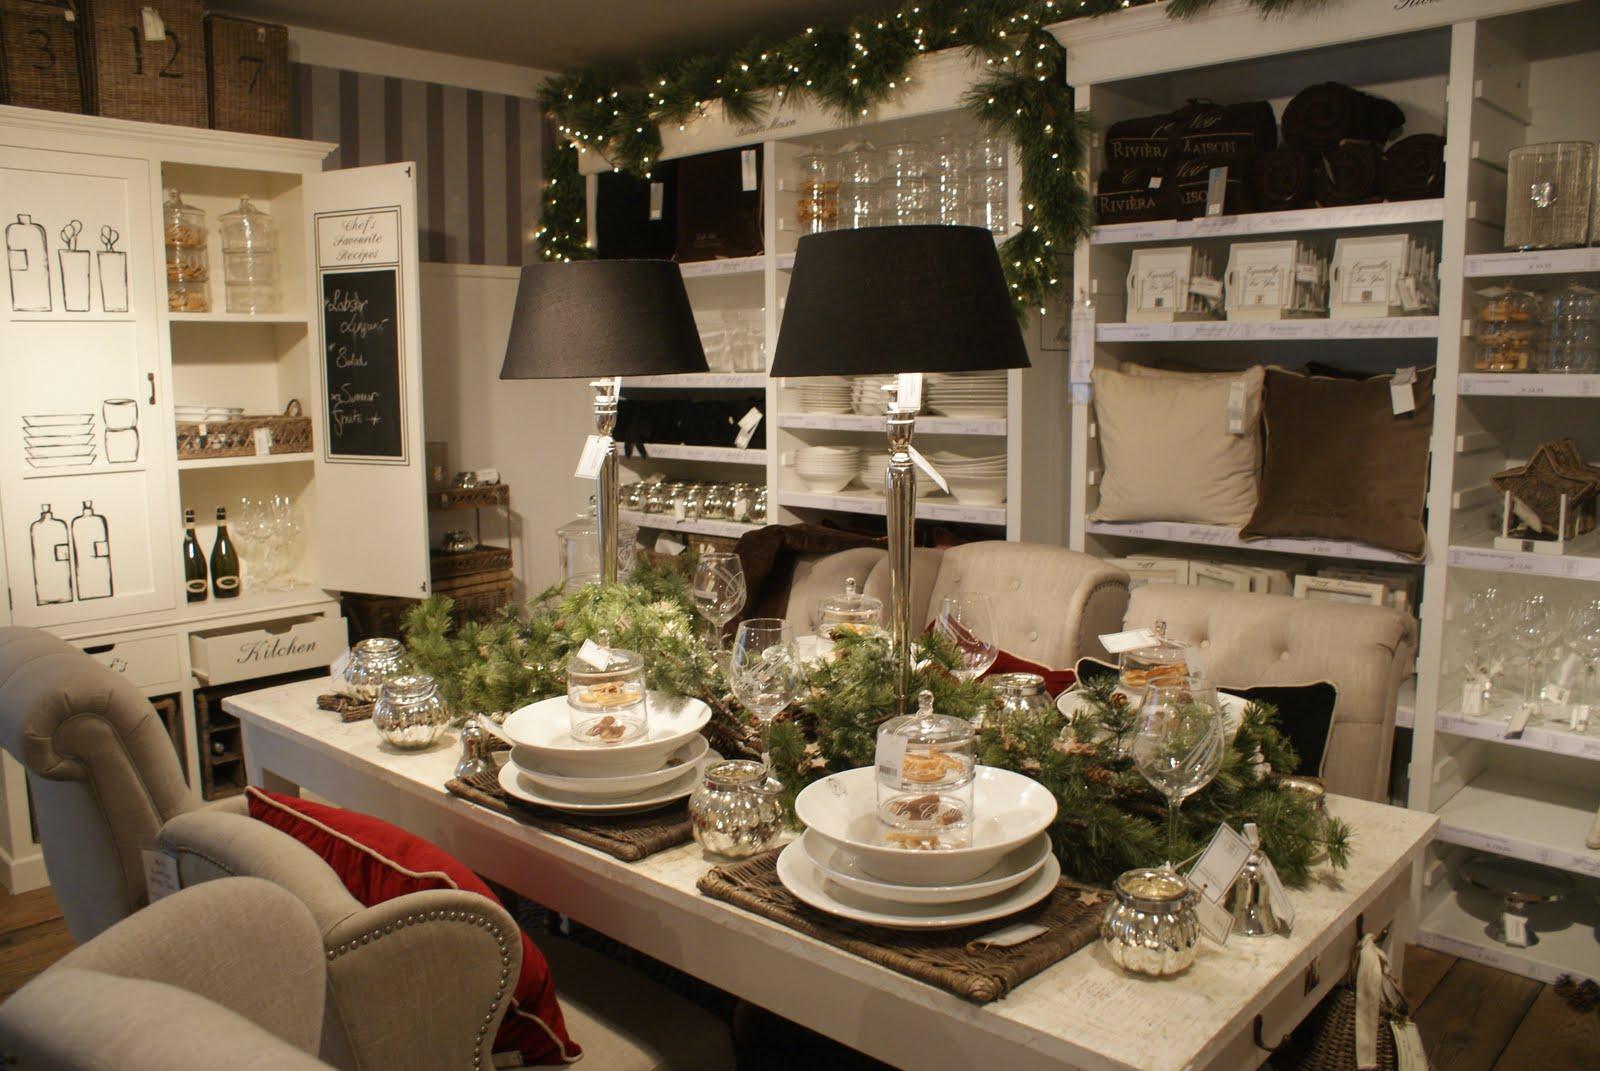 rmnorge riviera maison h st kolleksjon. Black Bedroom Furniture Sets. Home Design Ideas